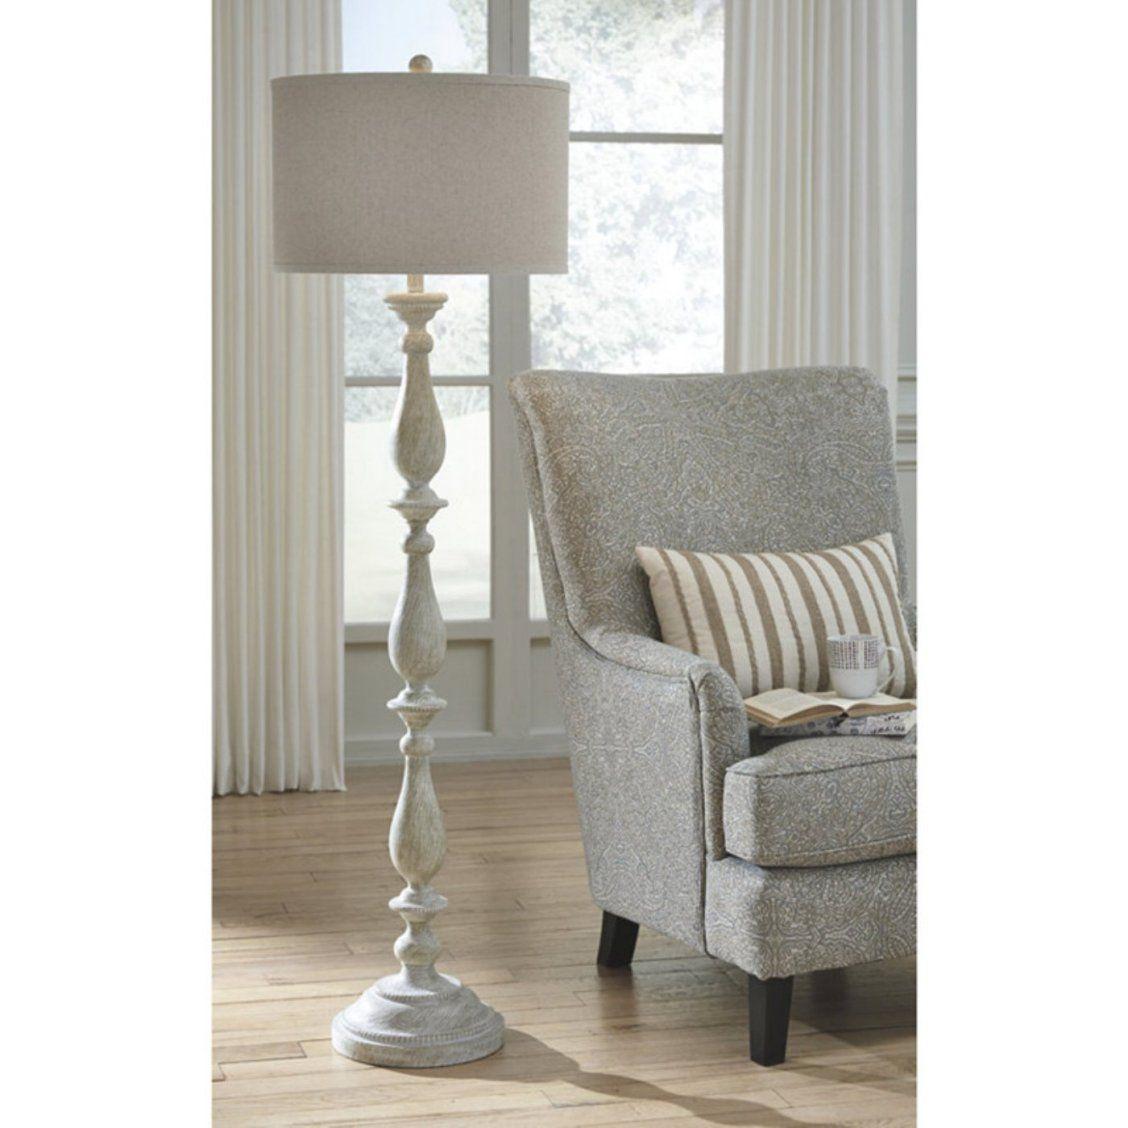 Signature Design by Ashley Bernadate Poly Floor Lamp